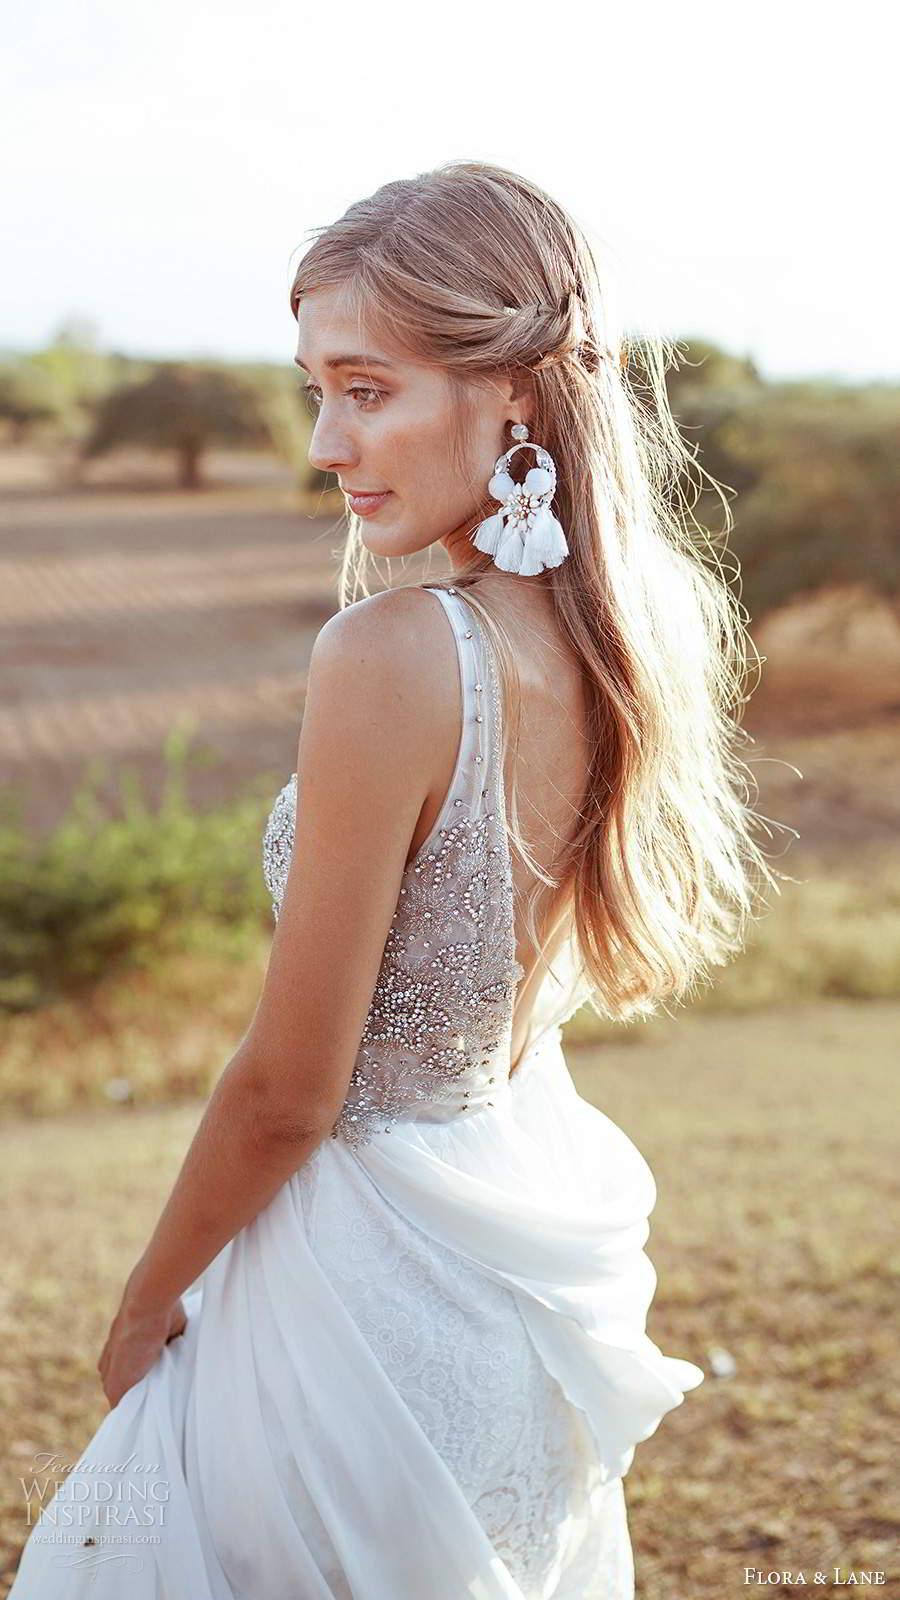 flora and lane 2019 bridal sleevelss straps v neckline heavily embellished bodice a line ball gown wedding dress v back chapel train (7) zsv